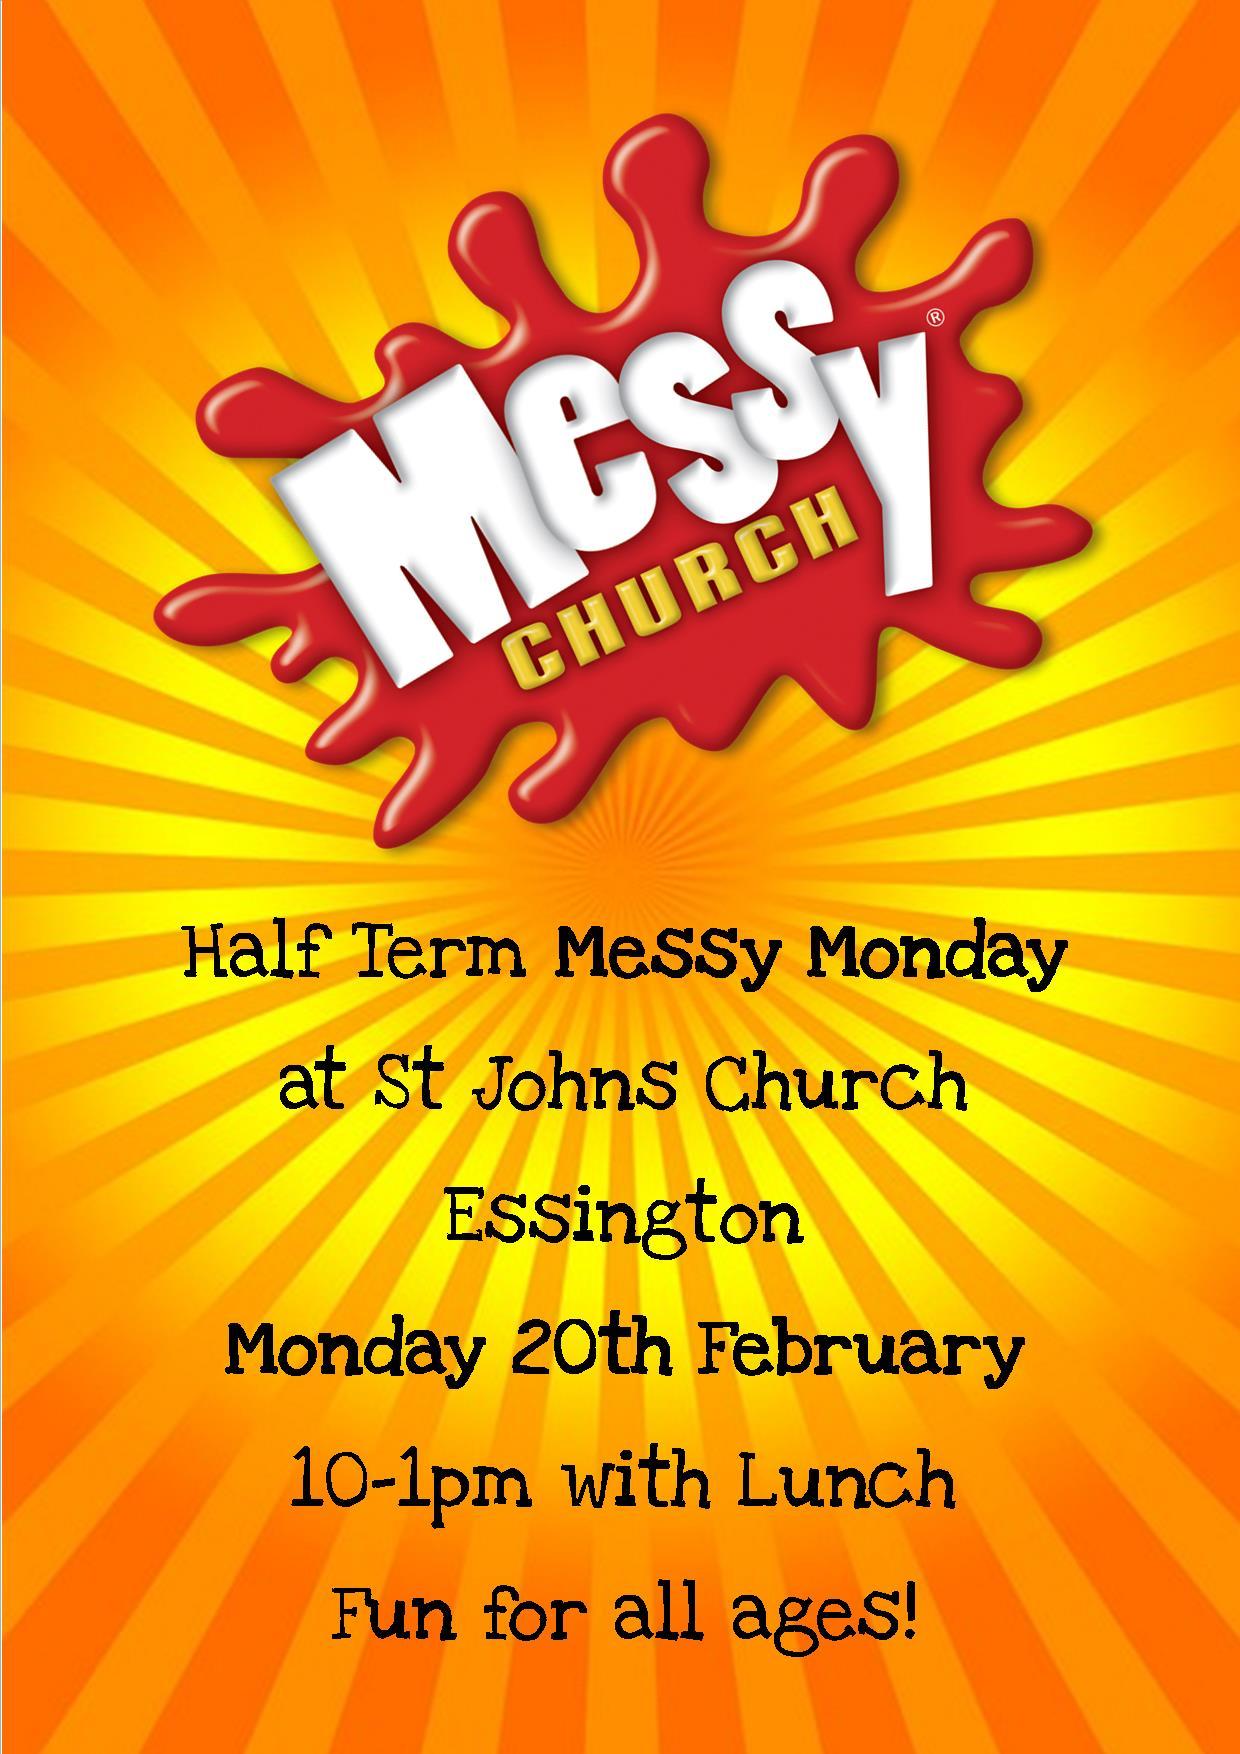 MESSY HALF TERM MONDAY